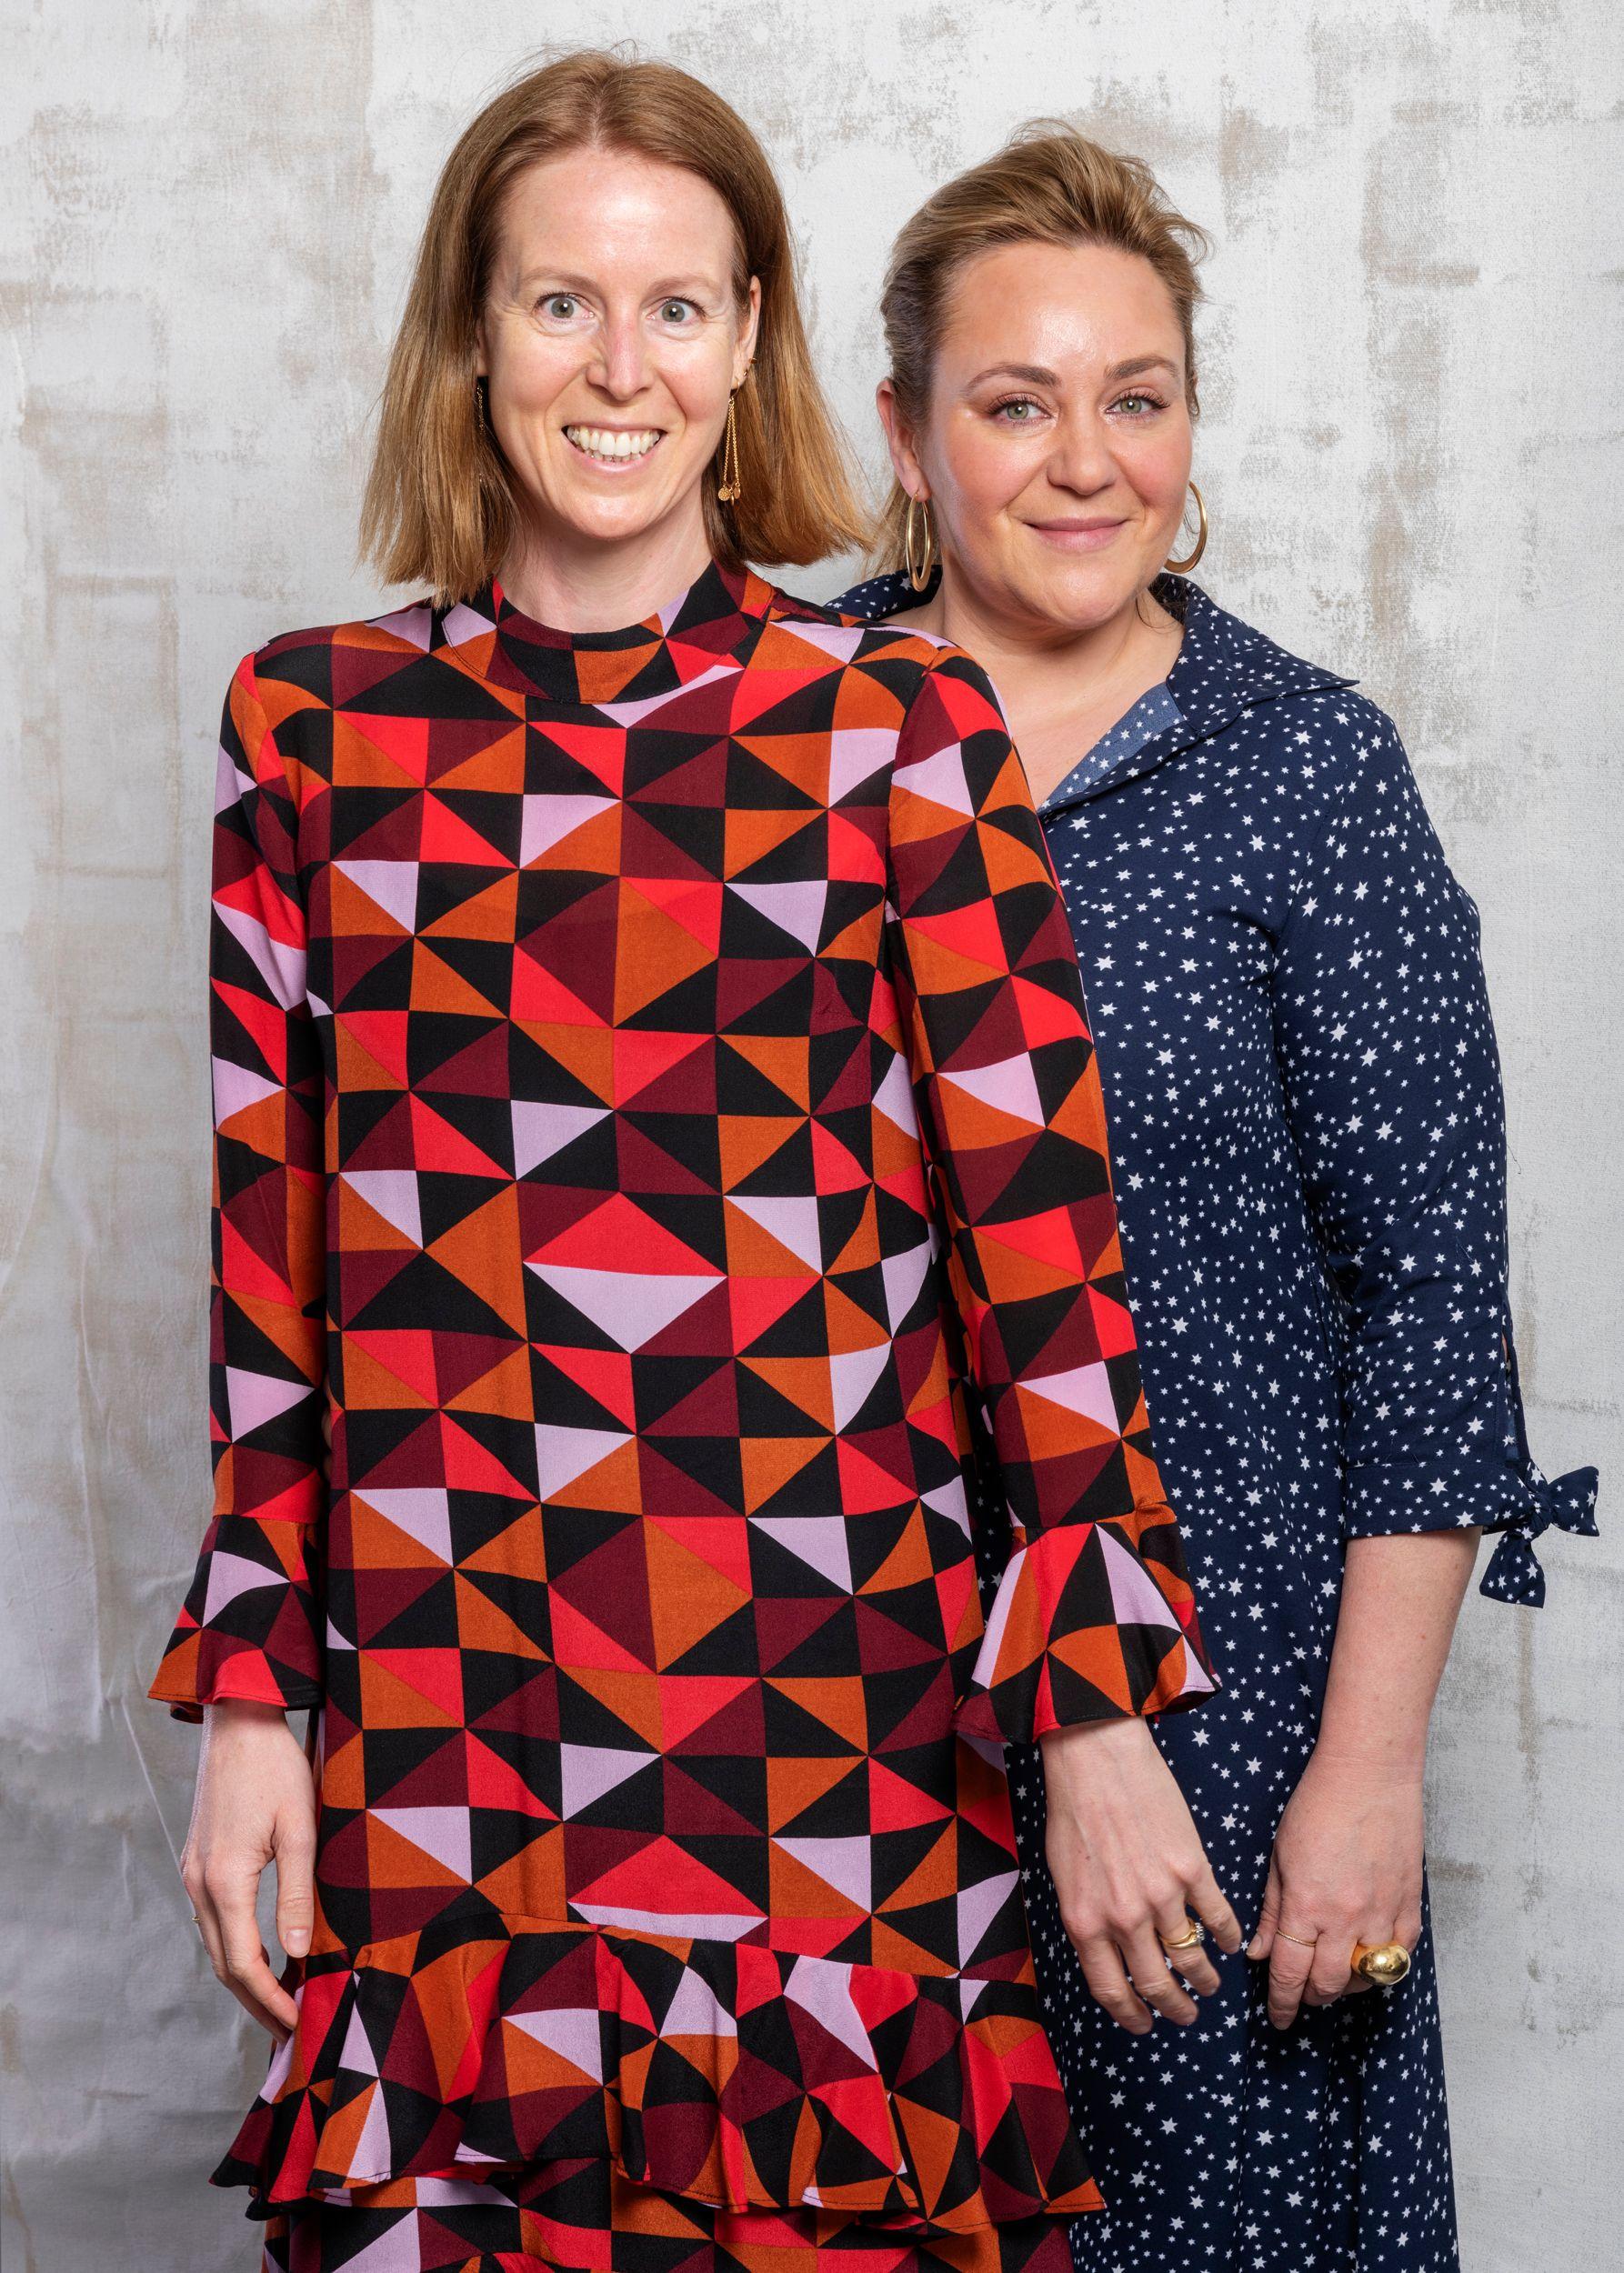 Emillie McMeekan & Annabel Rivkin -Midalts